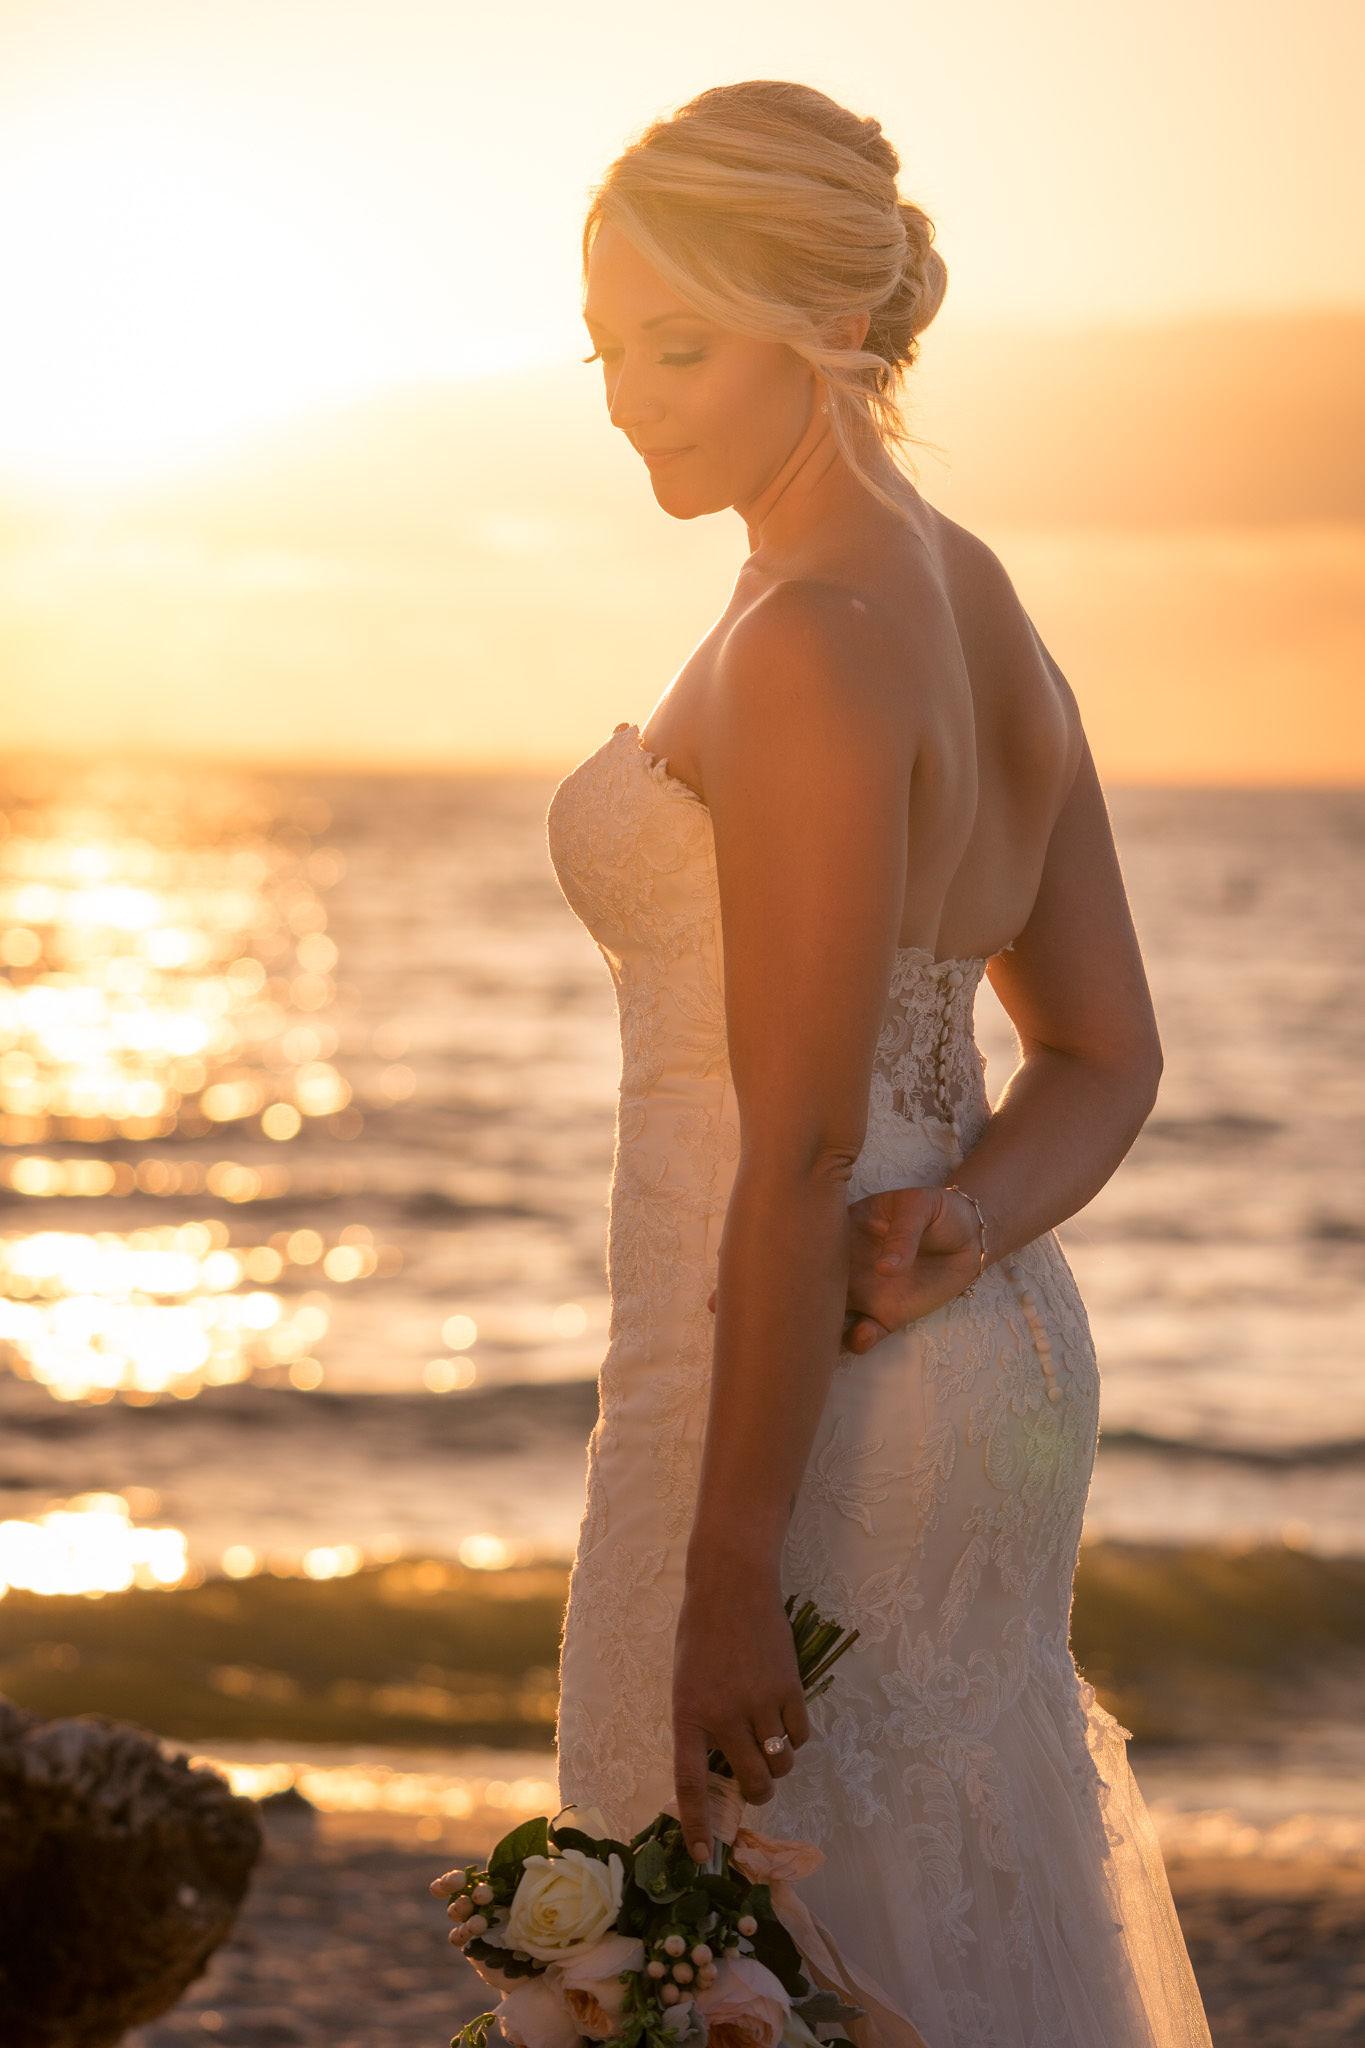 Amber's Bridal Portrait Session | Chicago Wedding Photographer-15.jpg